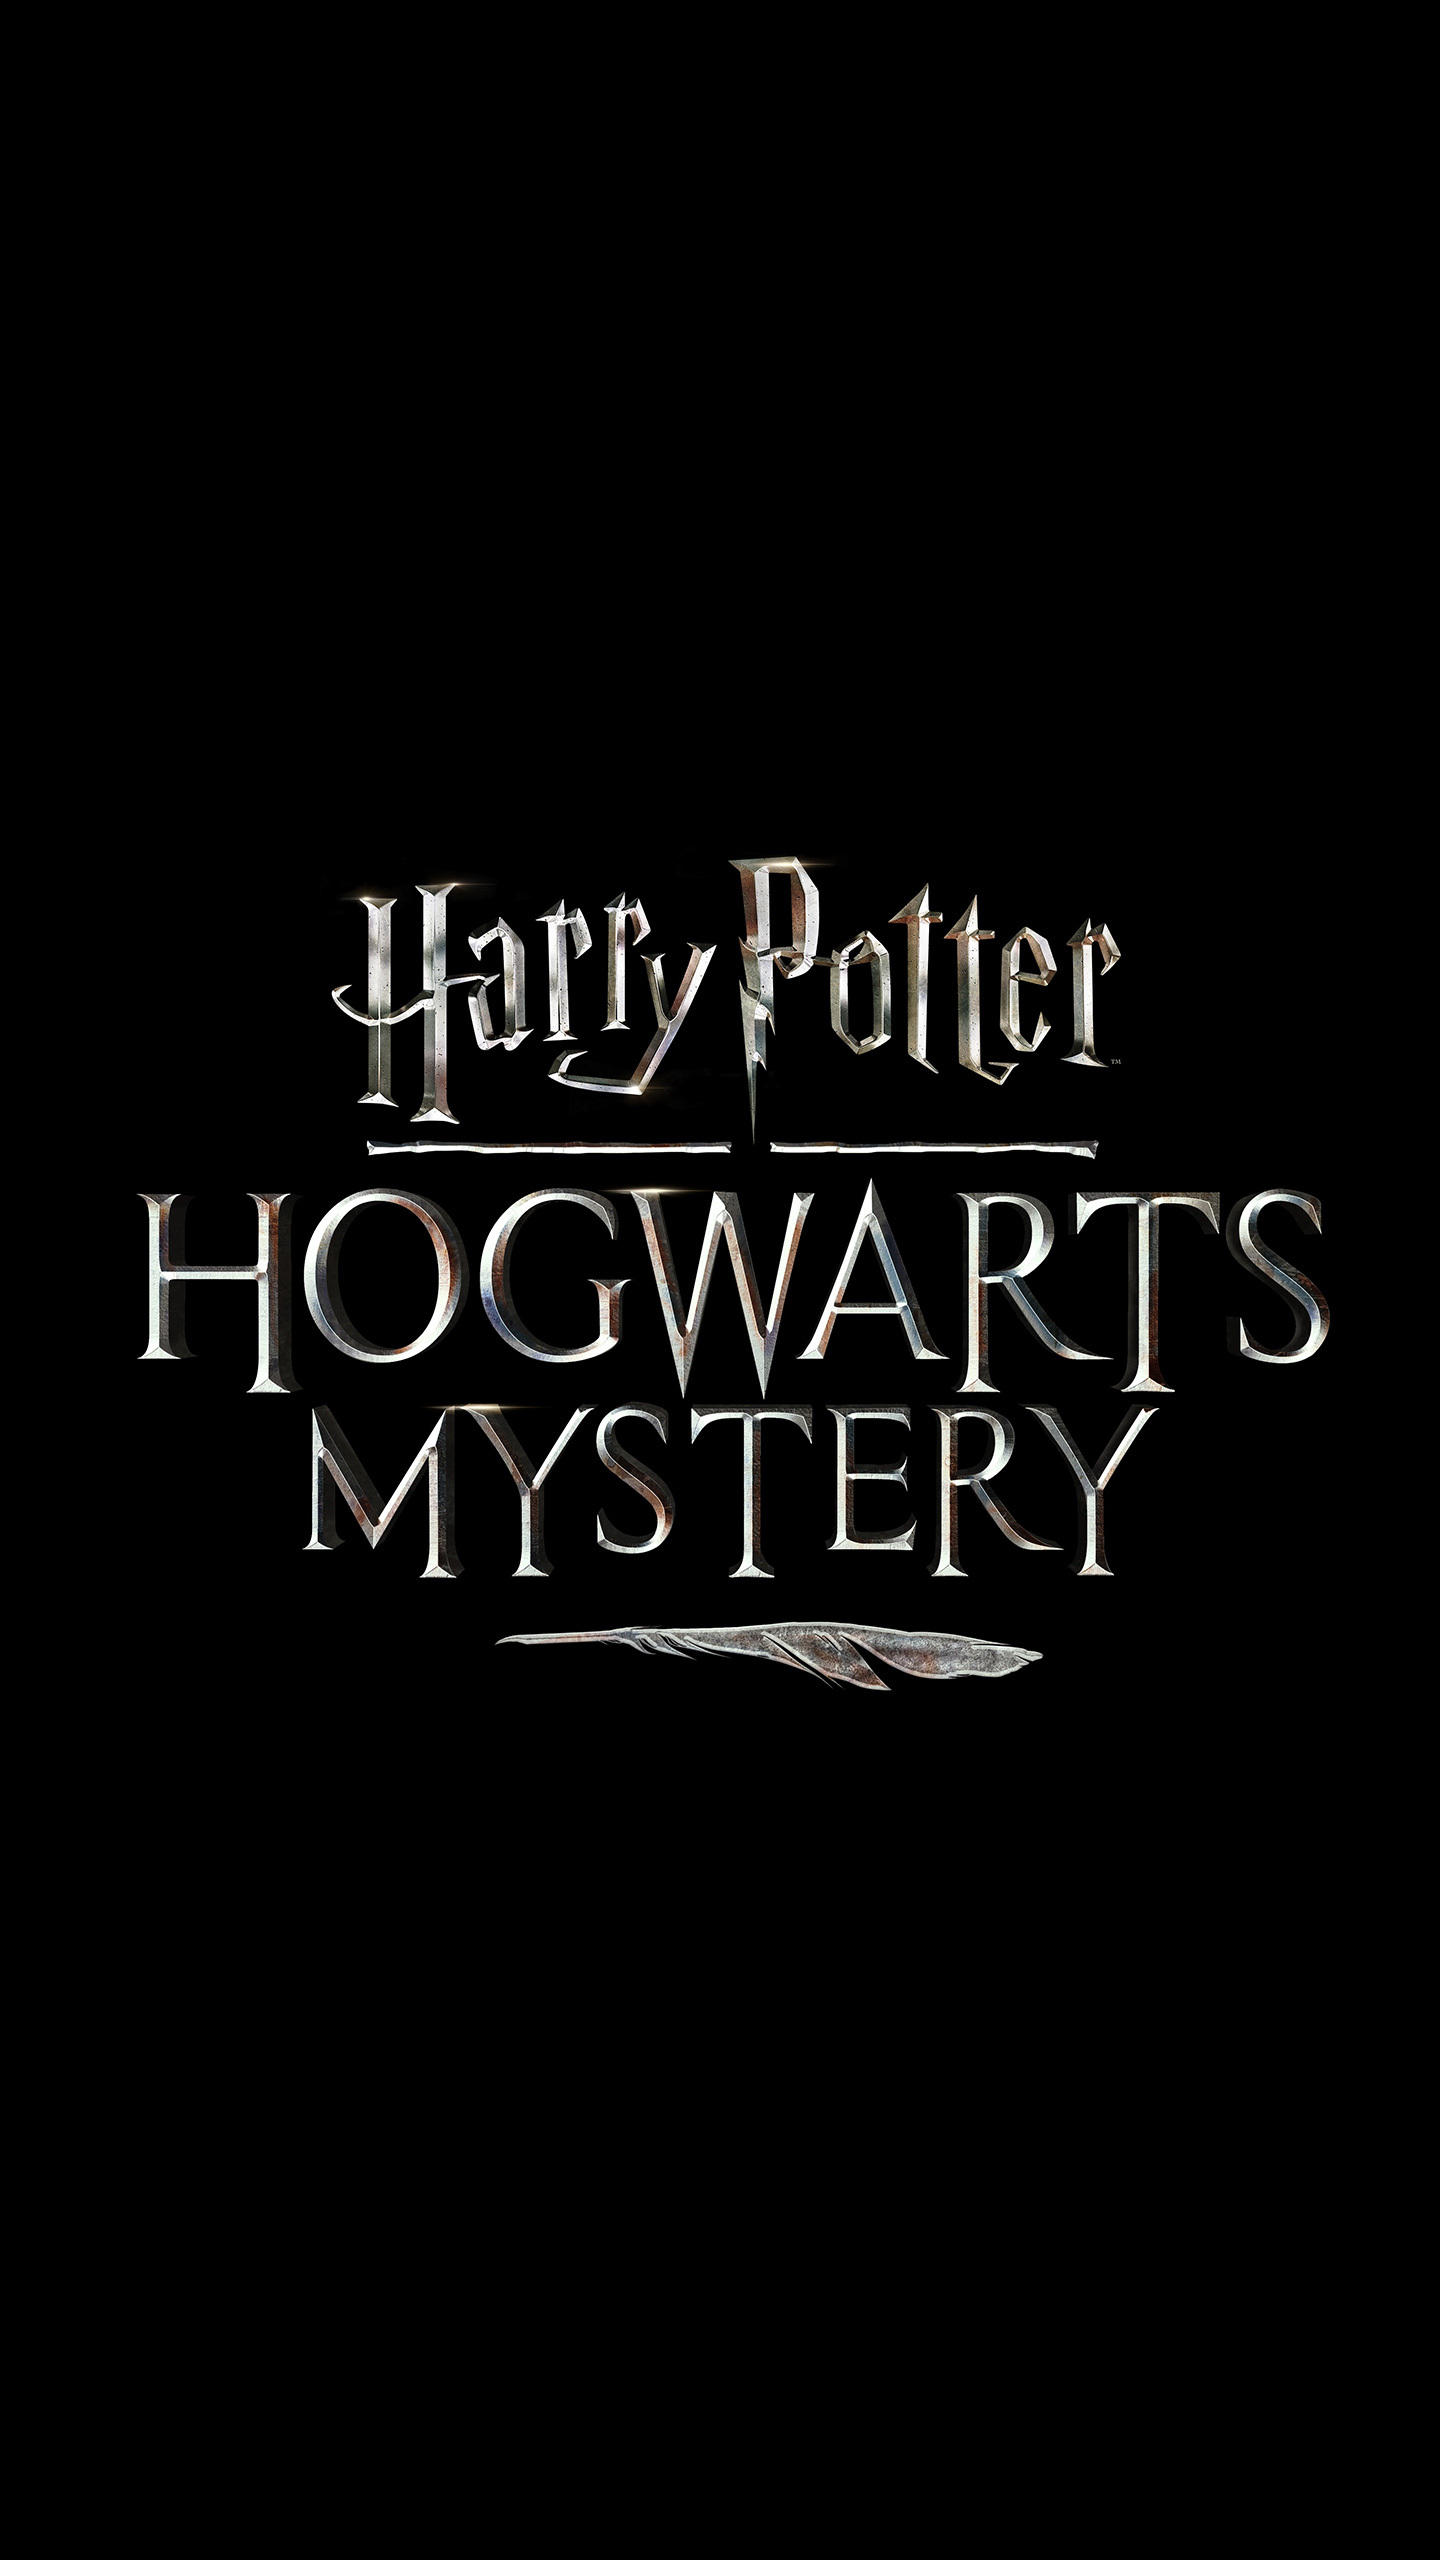 Fantastic Wallpaper Harry Potter Galaxy S6 - harry-potter-hogwarts-mystery-game-logo-gc-1440x2560  Image_46378.jpg